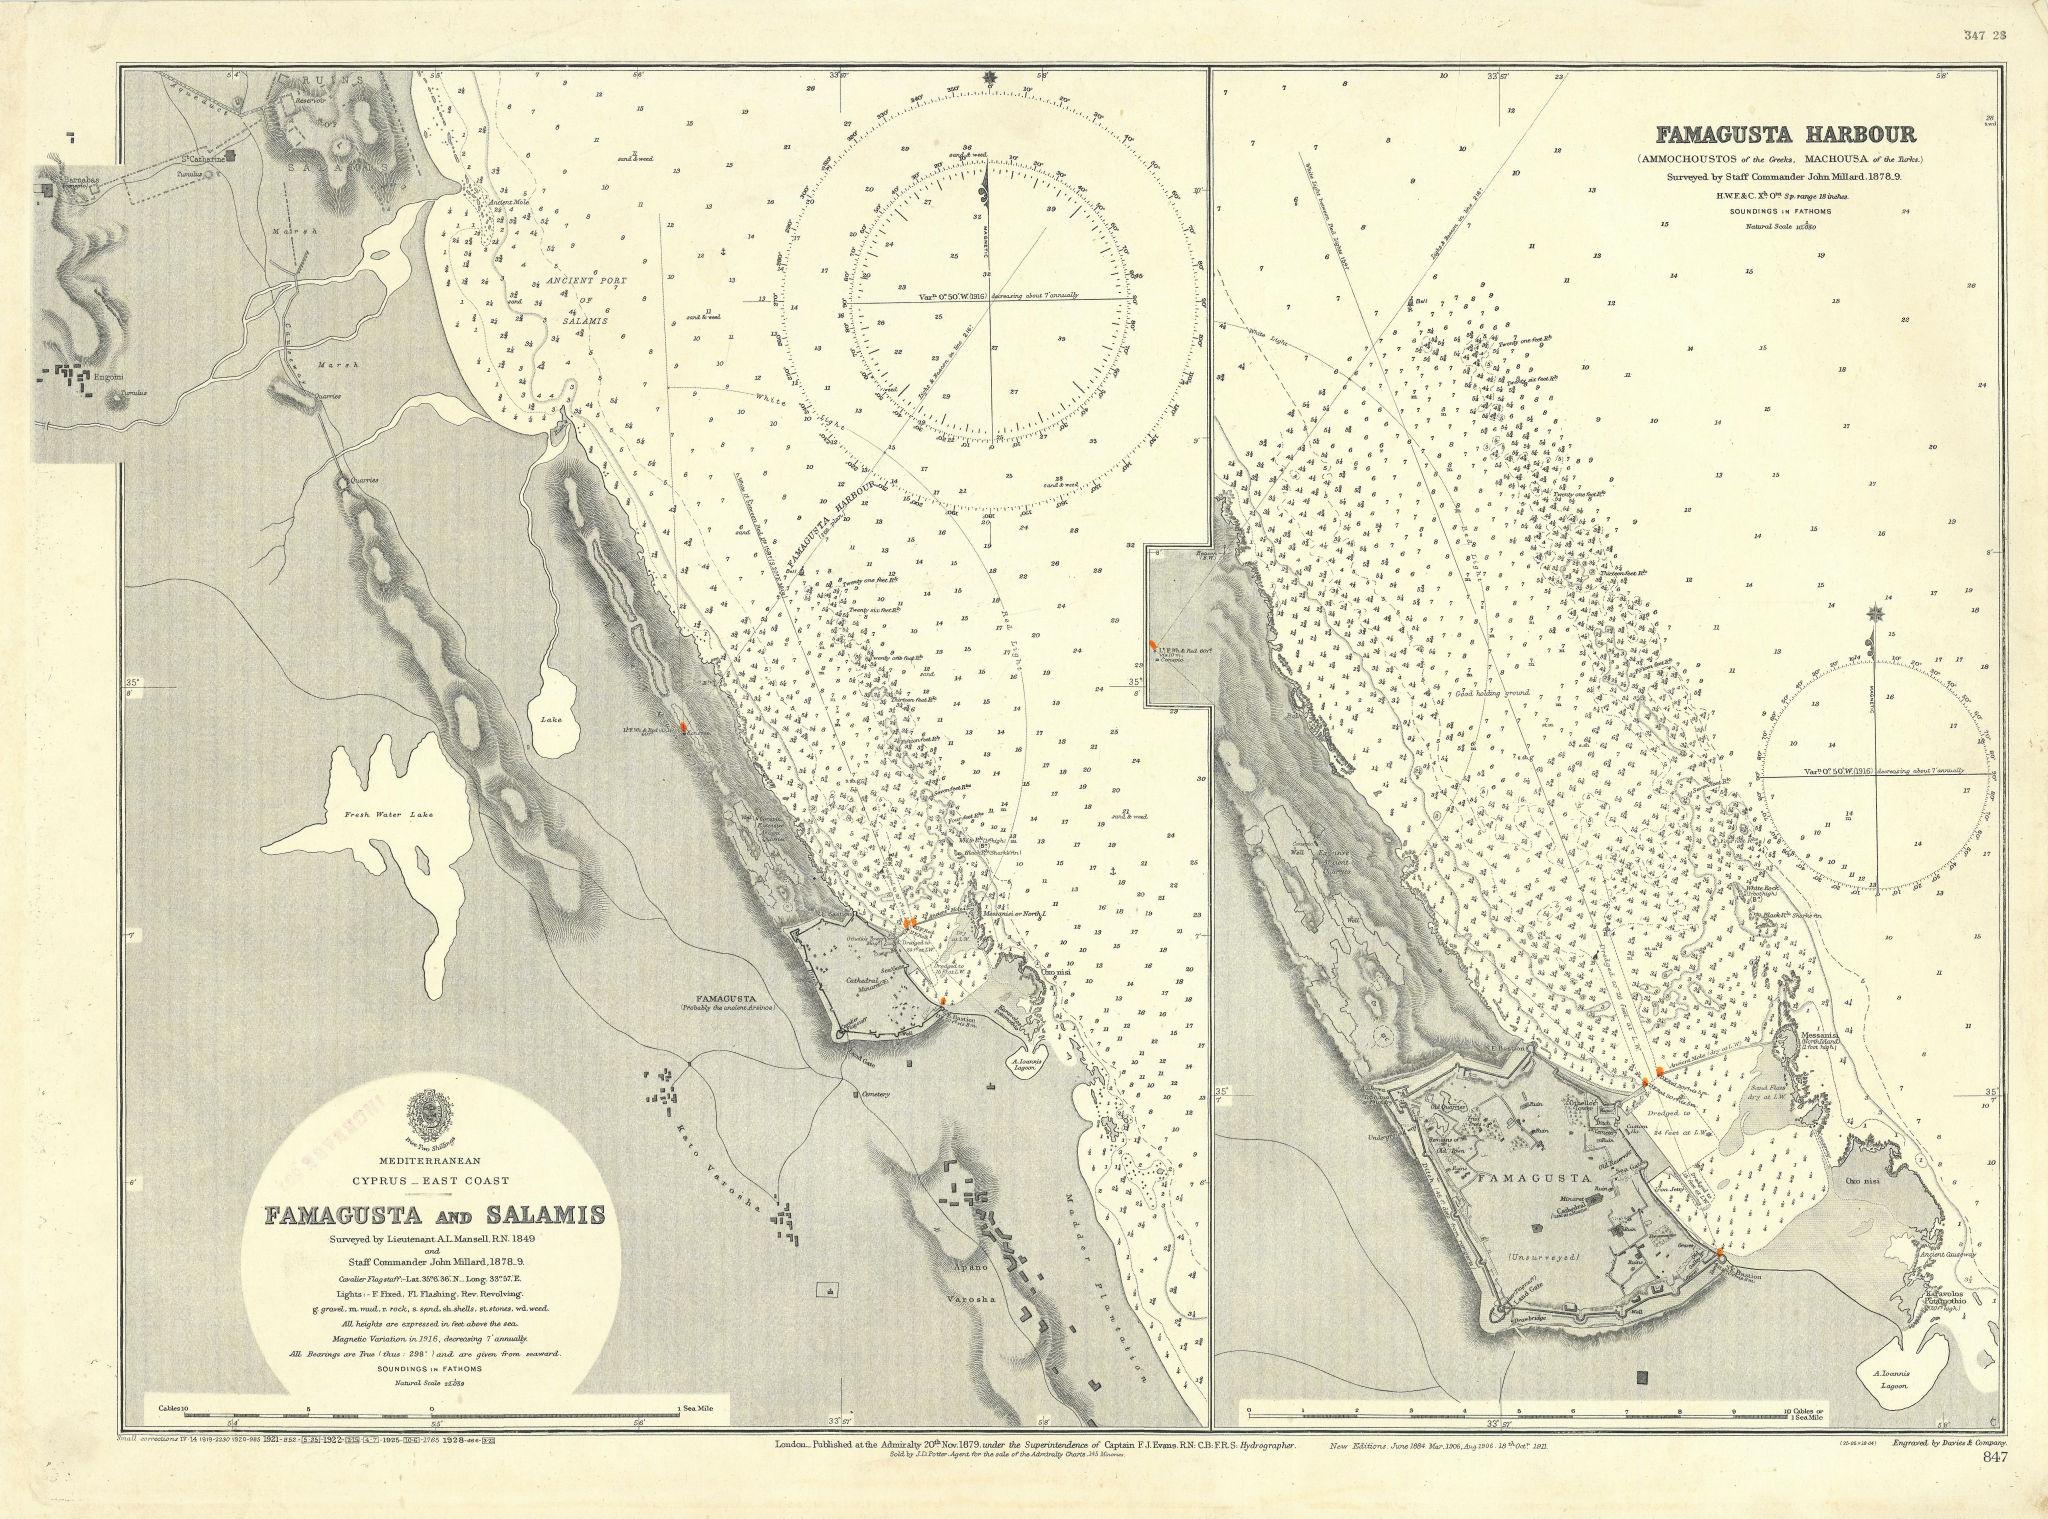 Famagusta harbour Salamis Cyprus Gazimagusa ADMIRALTY sea chart 1879 (1928) map